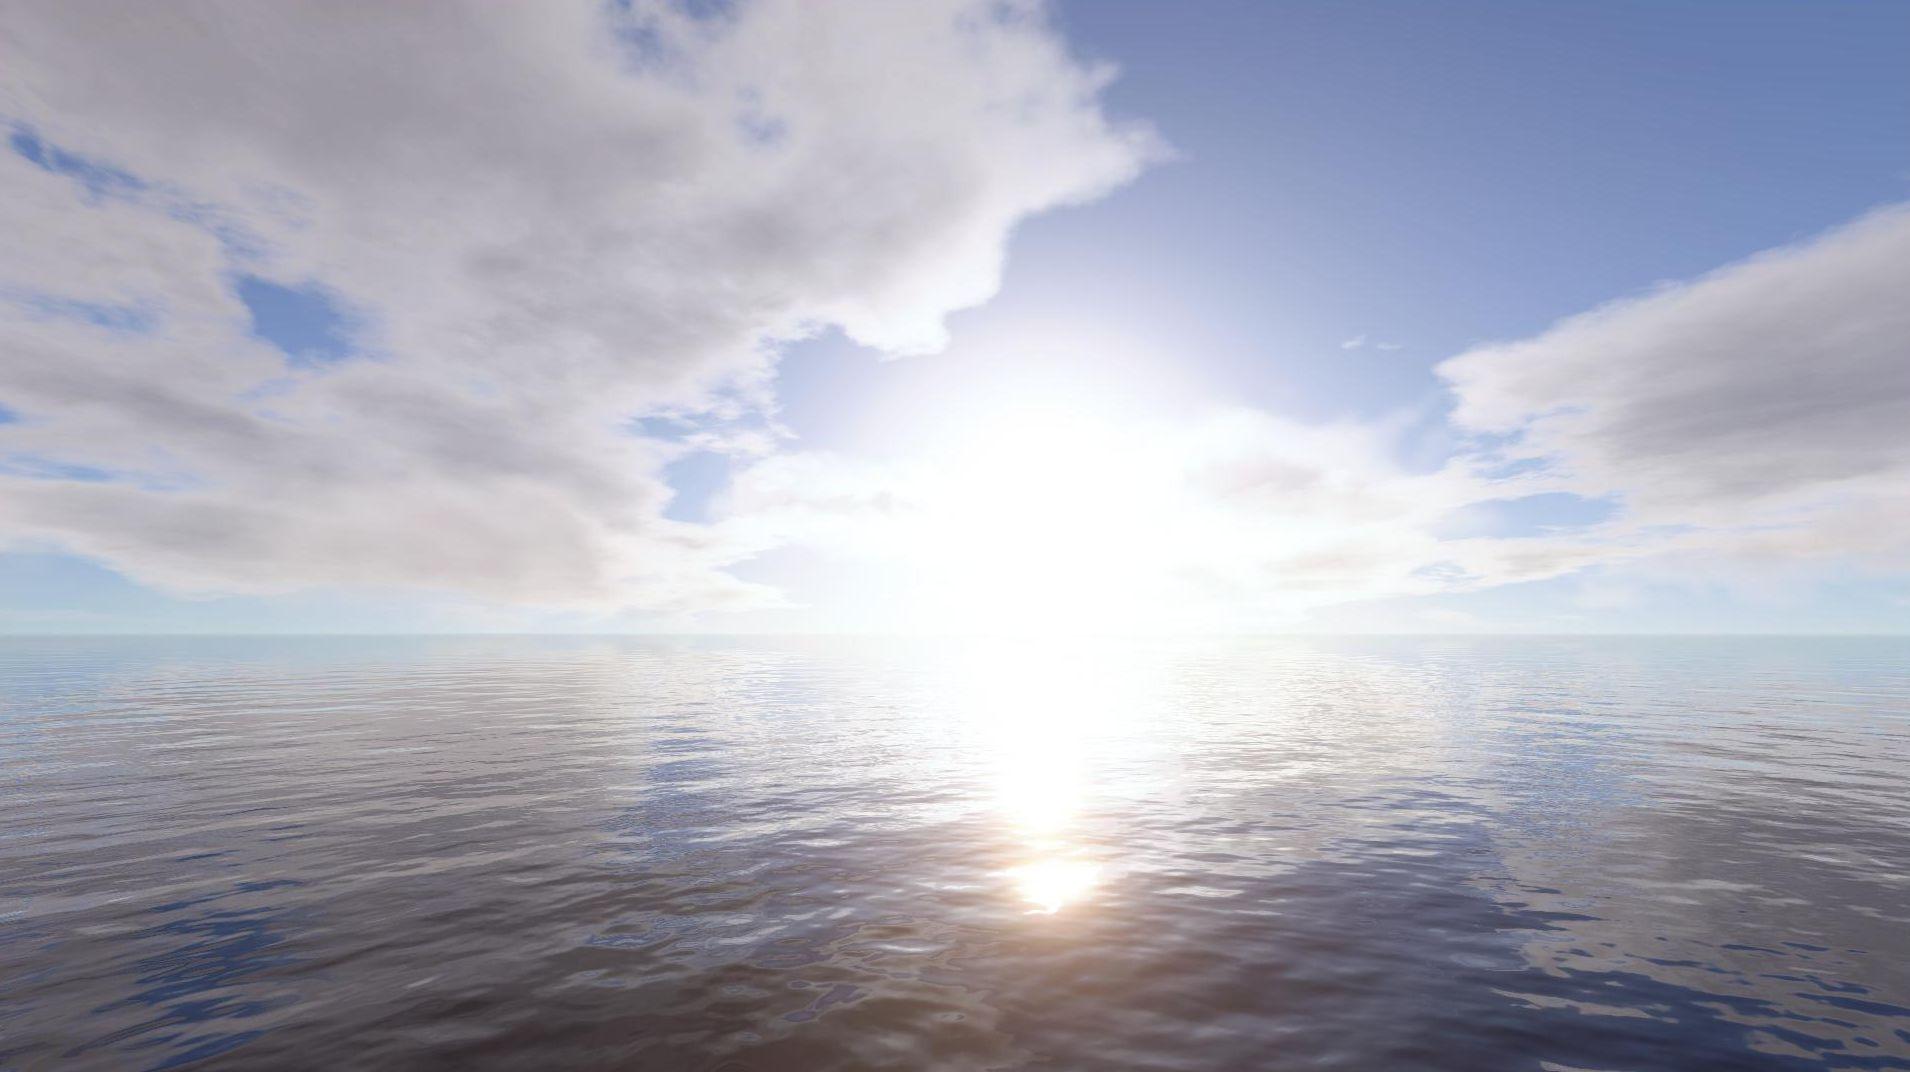 water_reflection_improvements_1_devblog_76